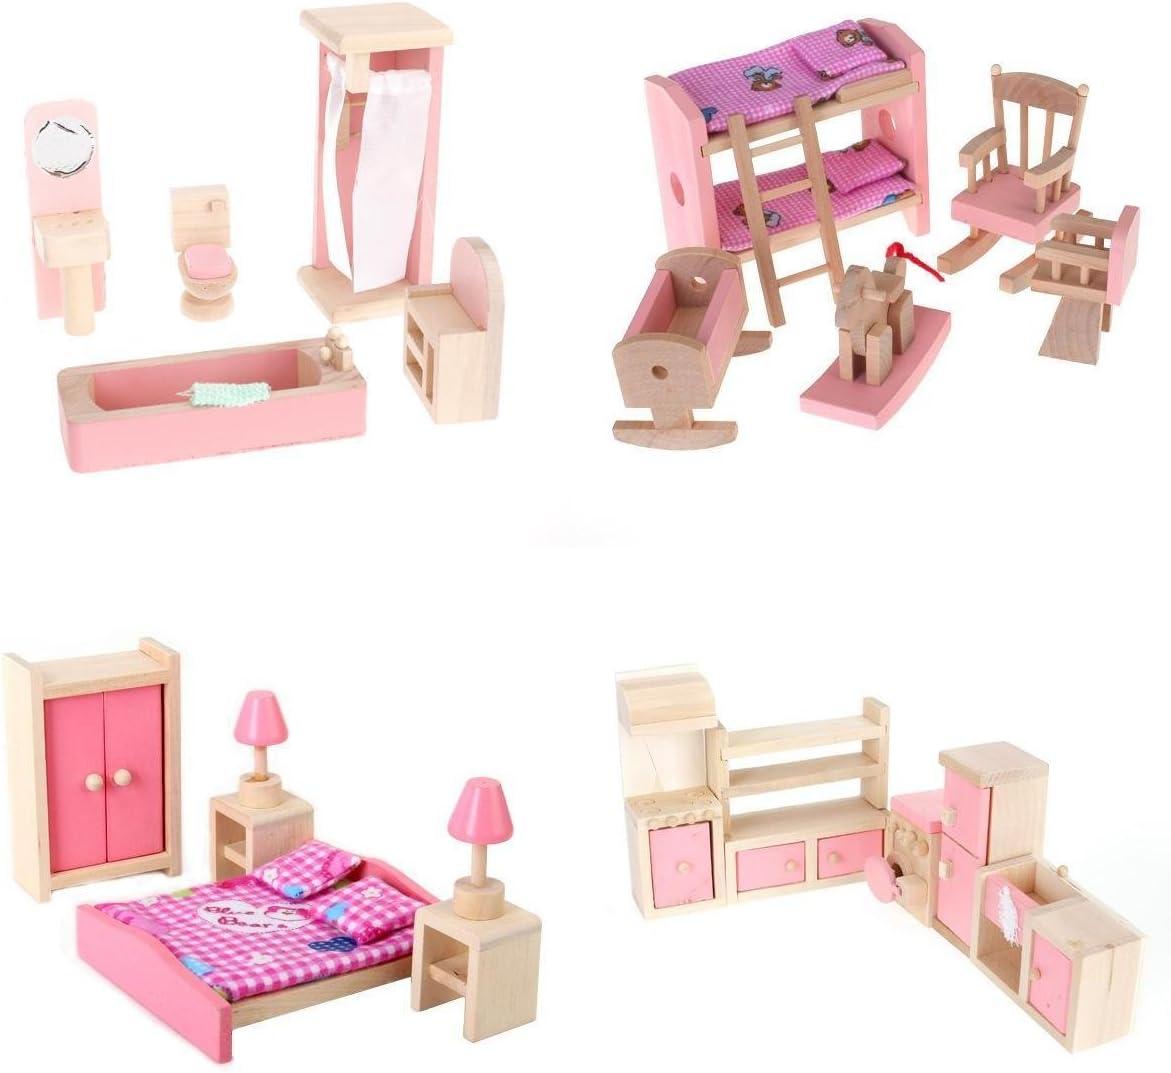 Plastic Kitchen Cabinet Miniature DollHouse Furniture Room Item Set Kids Toy